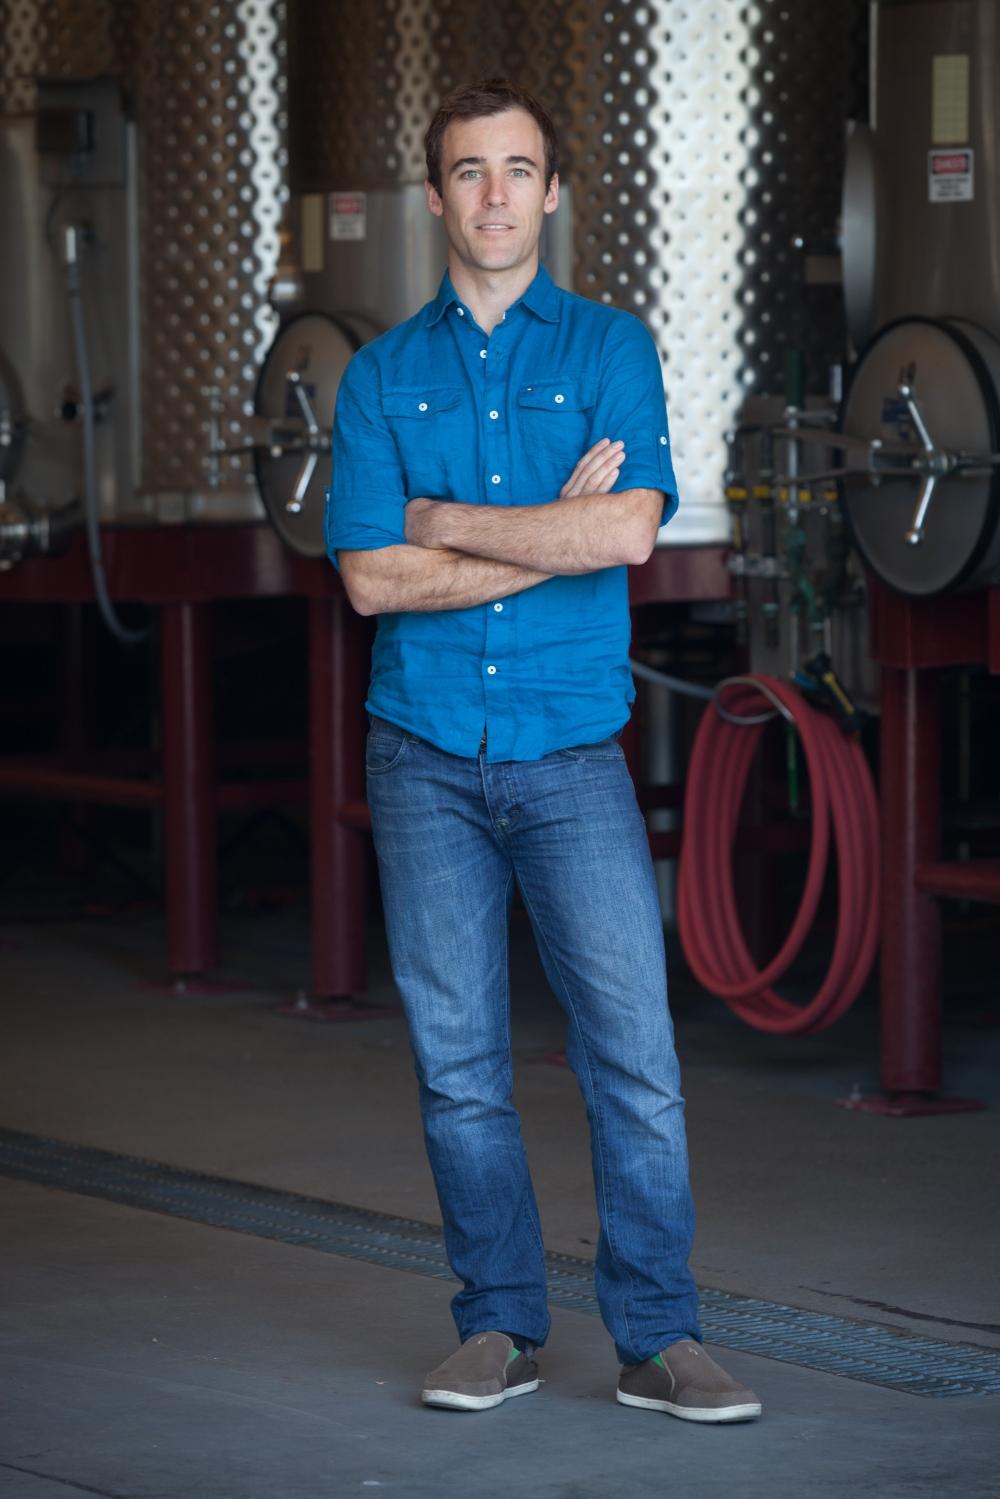 Napa Valley Winemaker, California Winemaker,